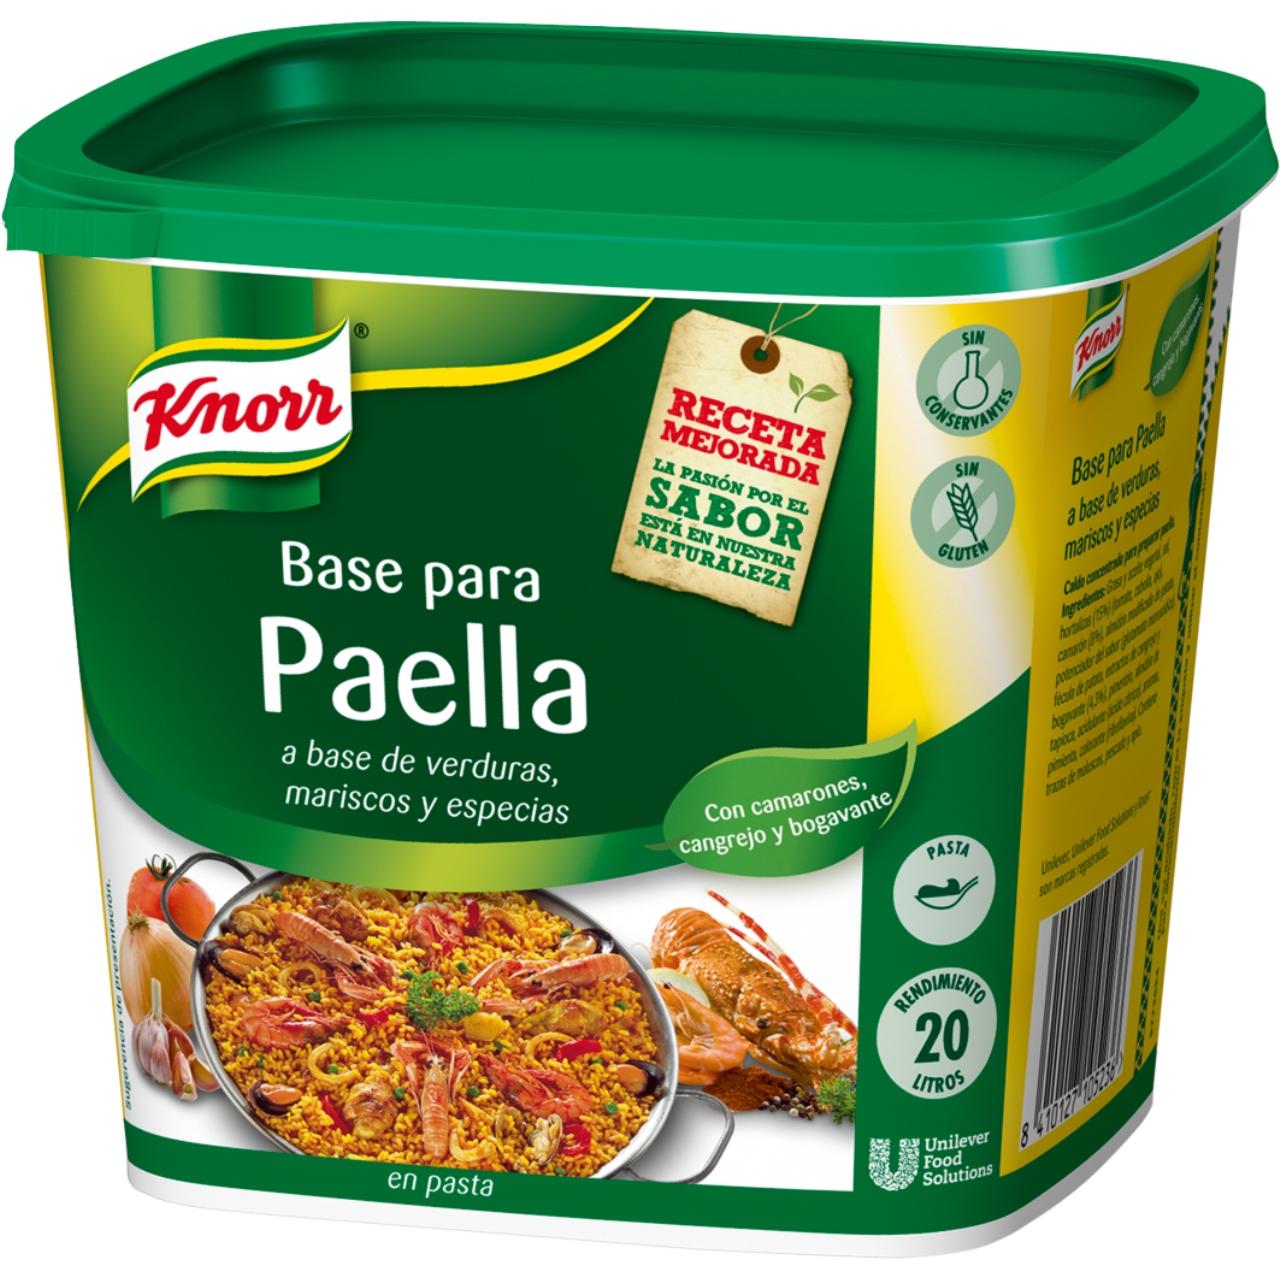 Base per a paella 1kg. Knorr